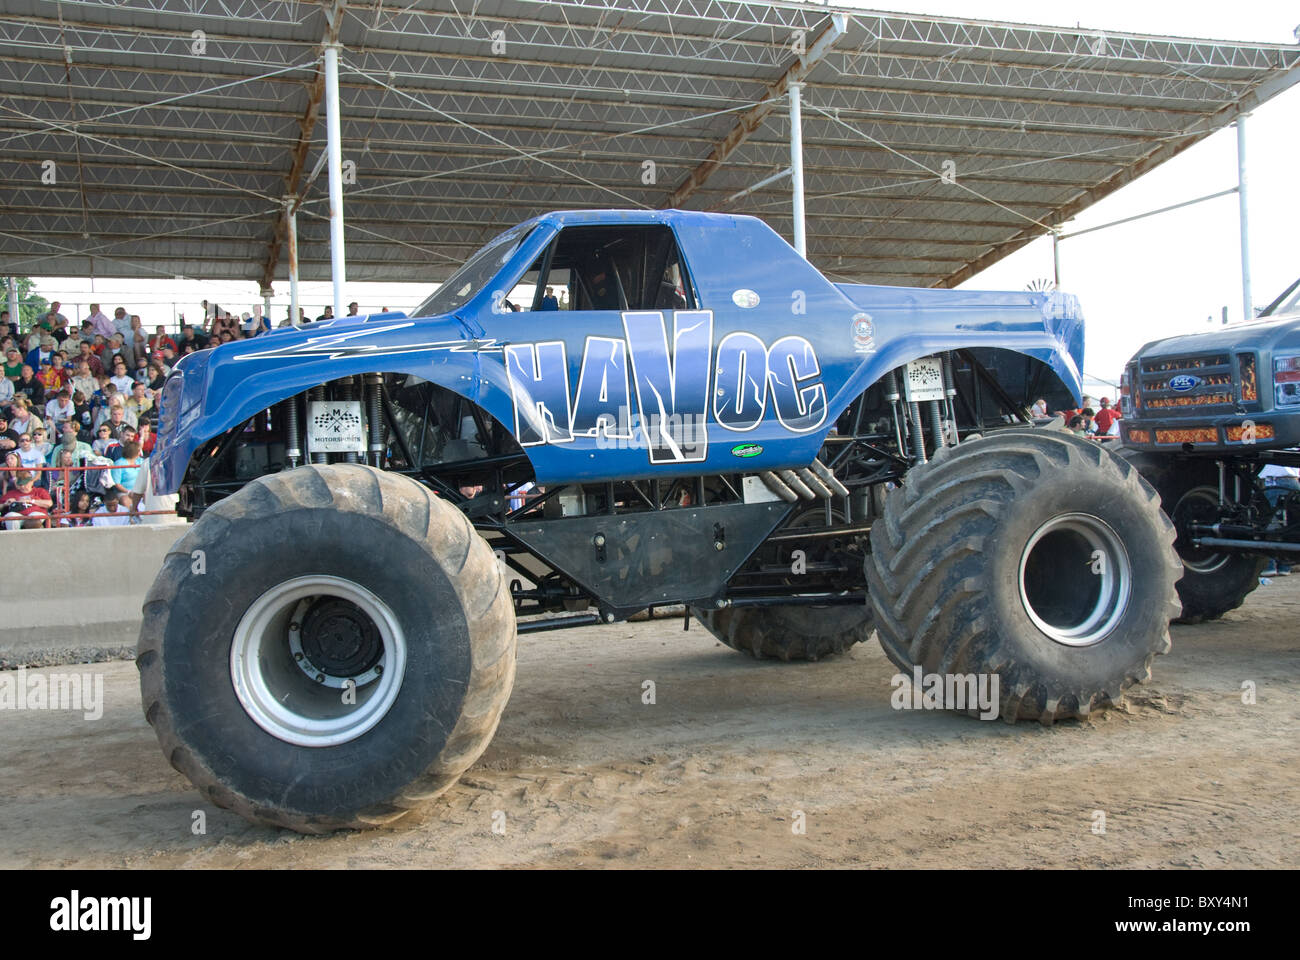 National monster truck show laporte county fairgrounds laporte indiana usa stock image